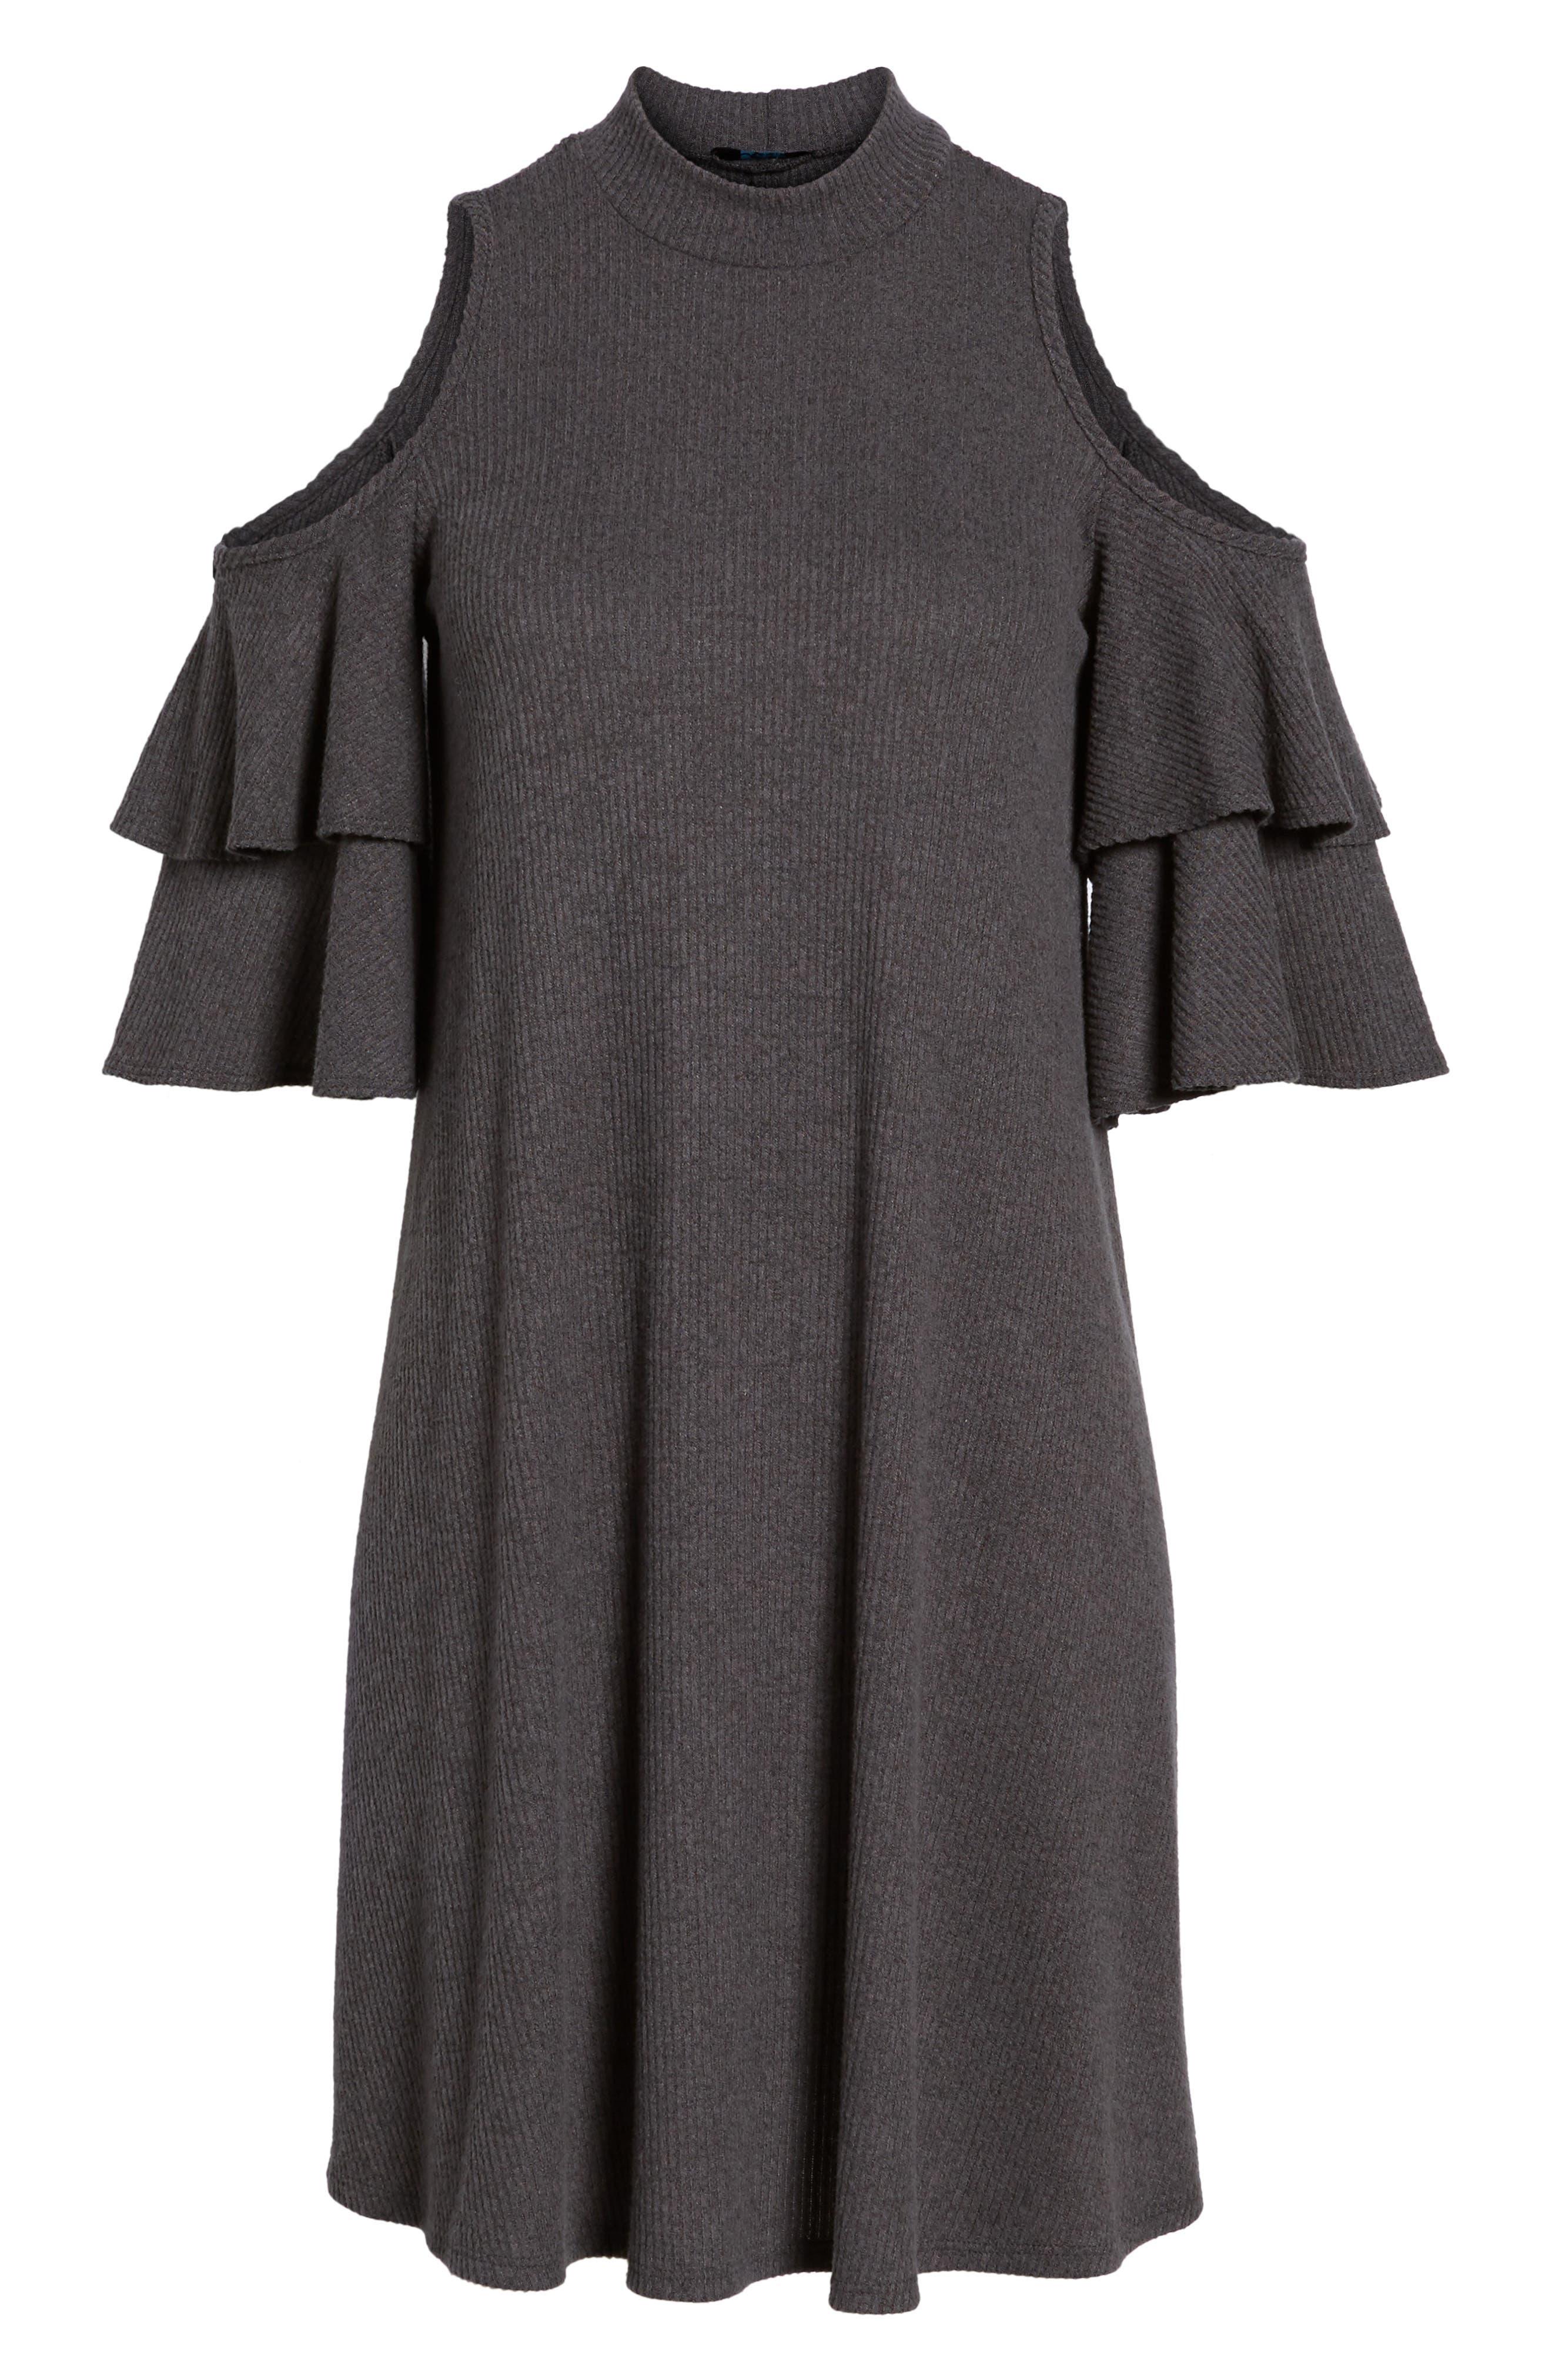 Ruffle Cold Shoulder Shift Dress,                             Alternate thumbnail 6, color,                             Charcoal